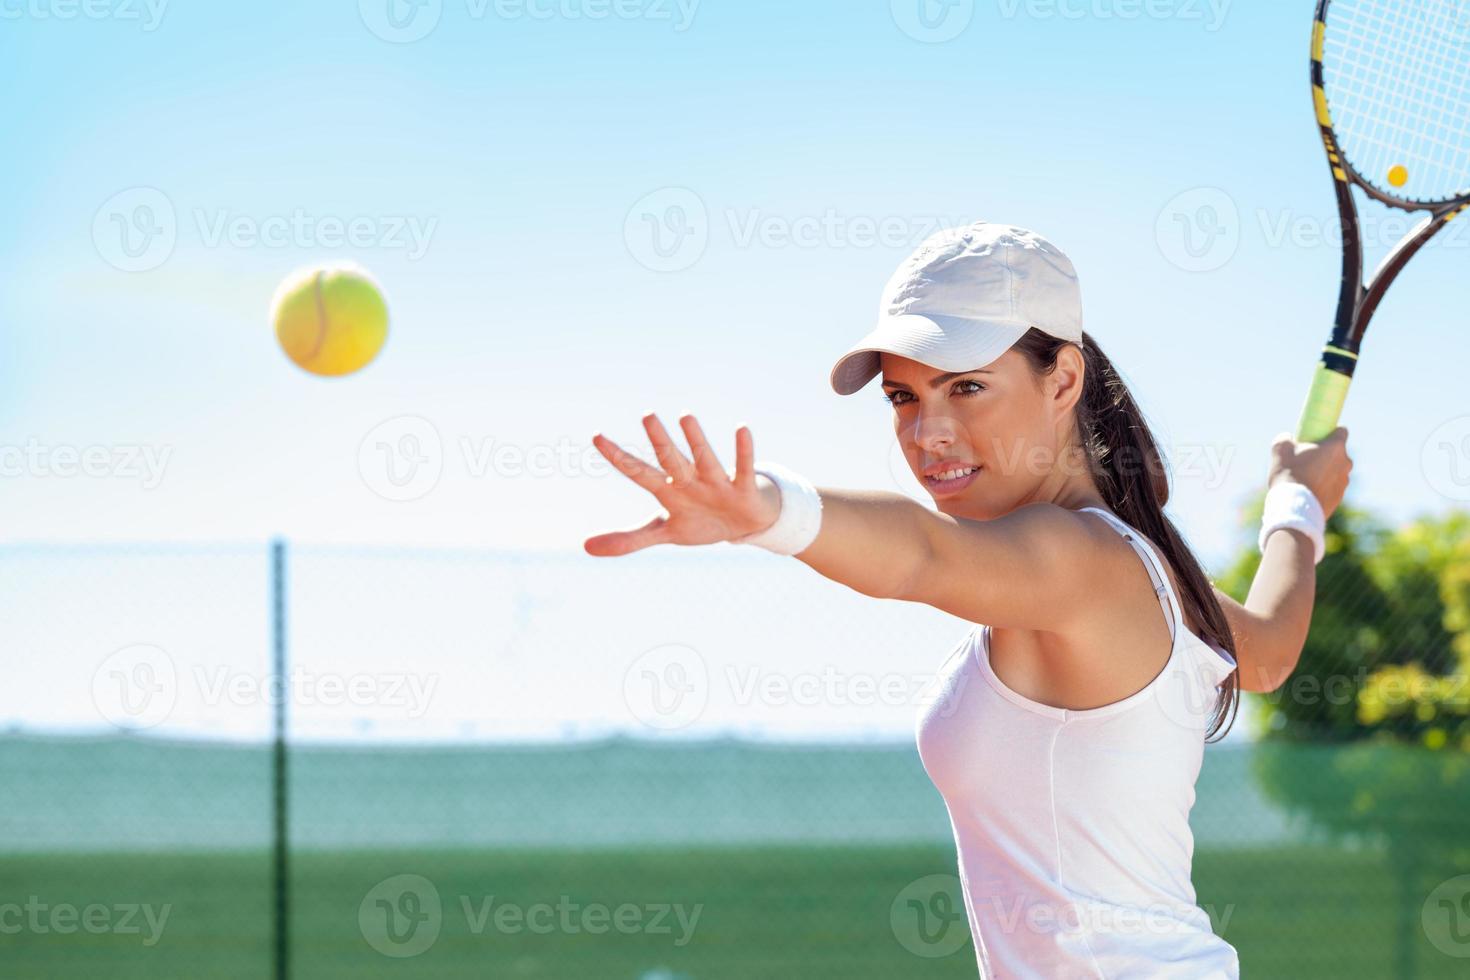 tennis foto